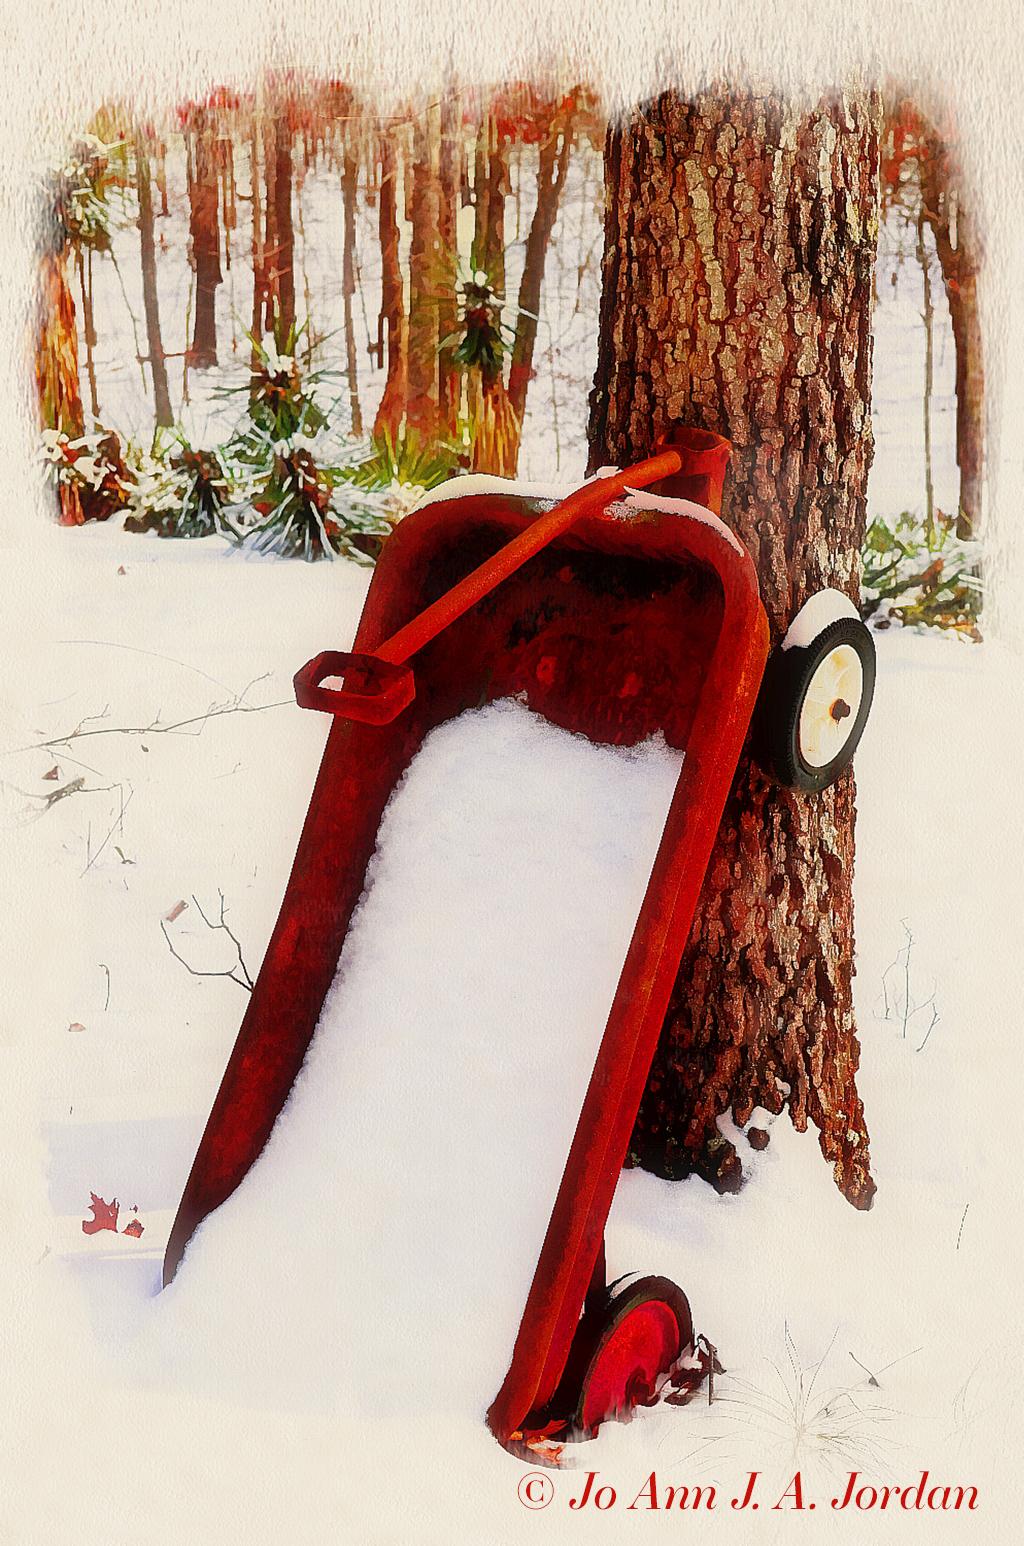 2020.07.04 Wagon in Snow Illustration rr